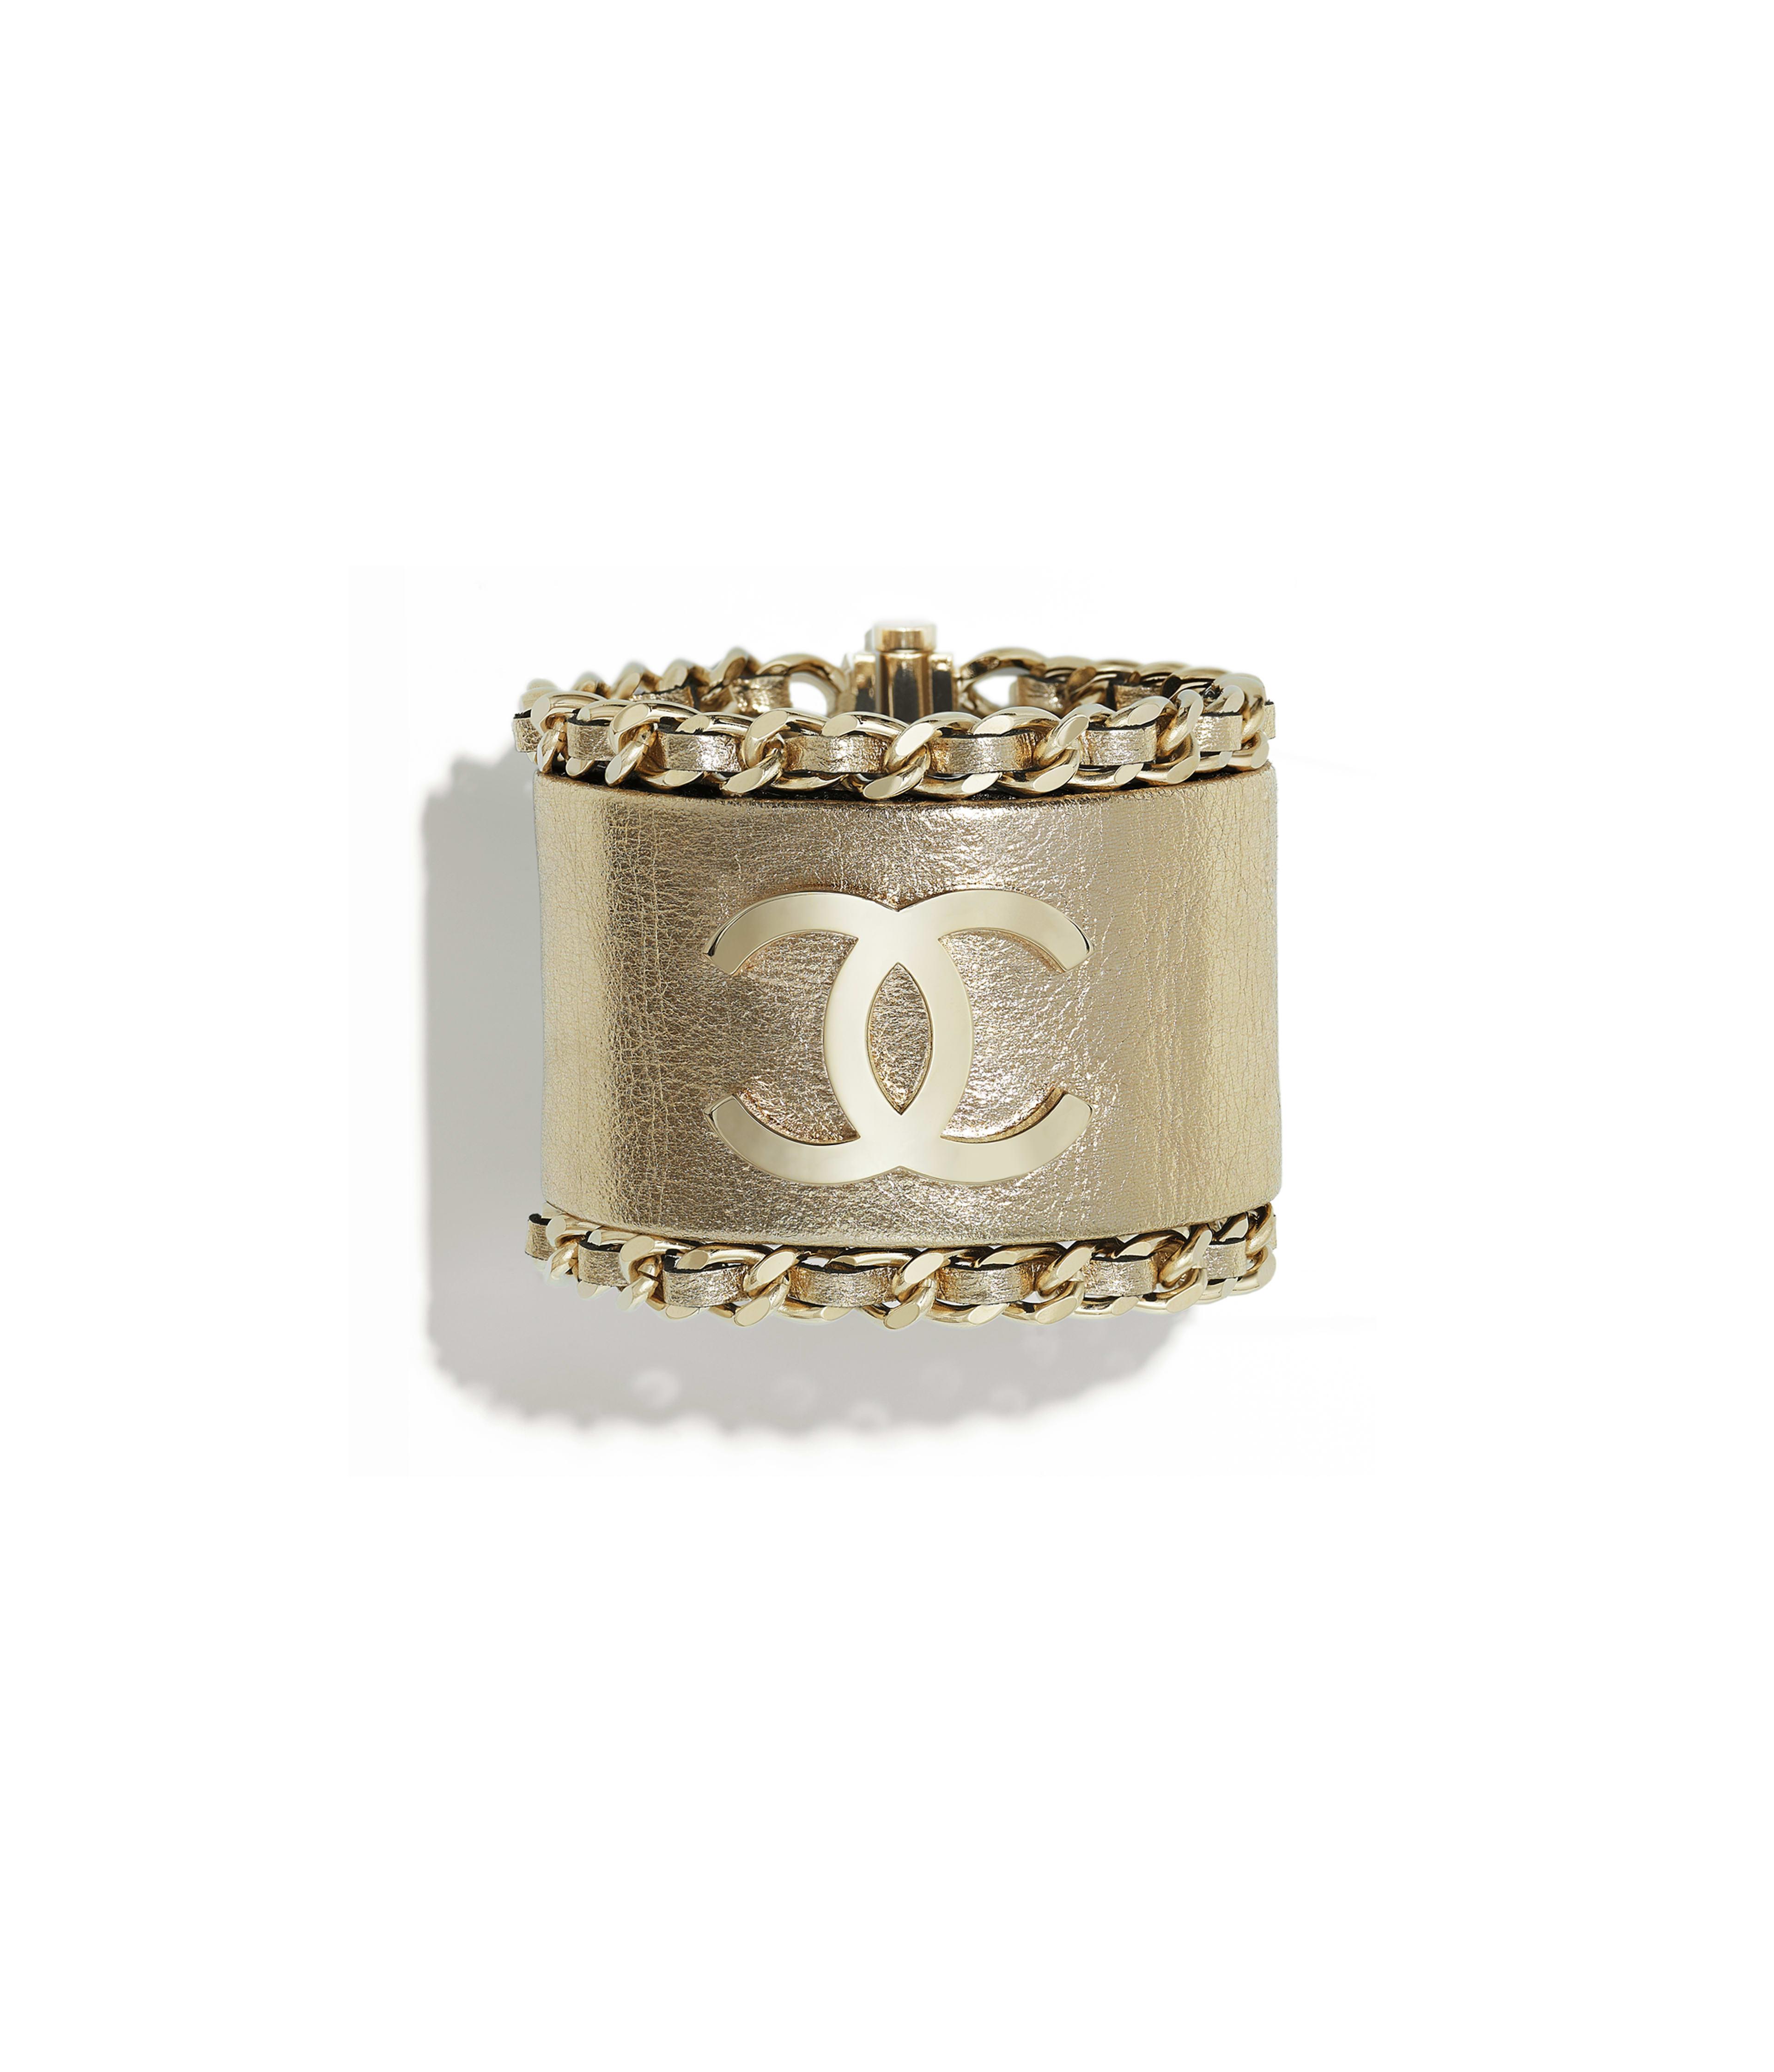 Cuff Metal Calfskin Gold Ref A53191y47058z6015